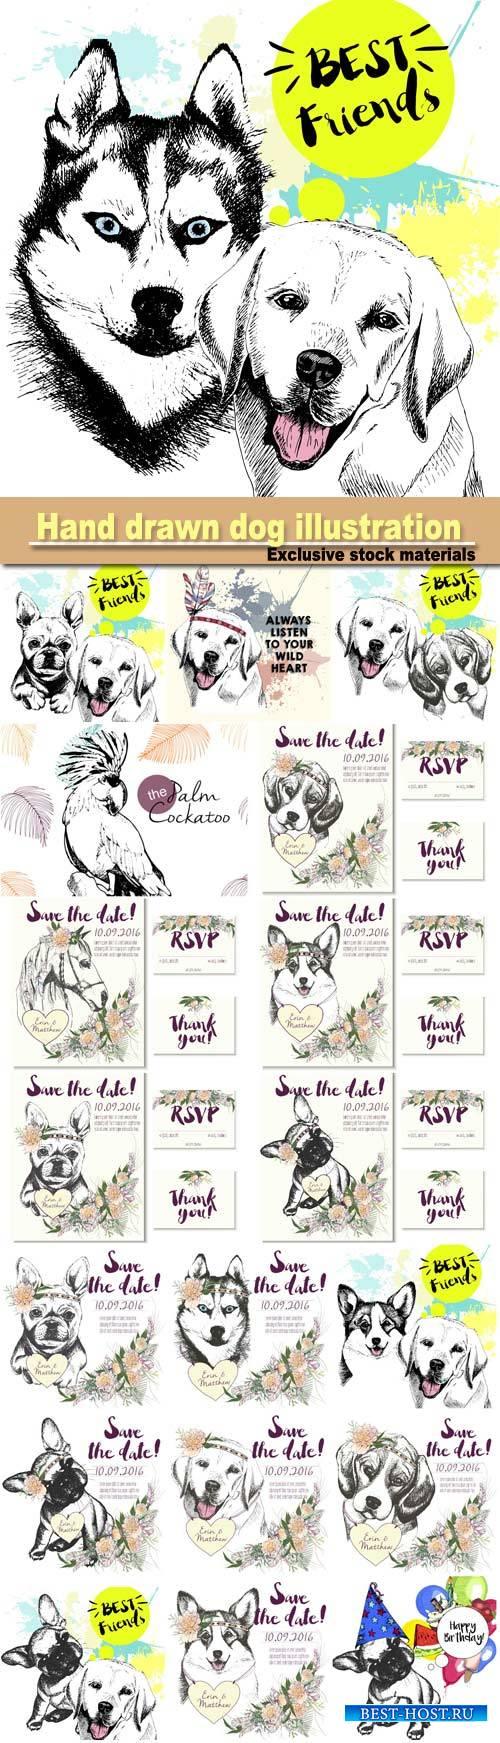 Color hand drawn domestic dog illustration, animal vector